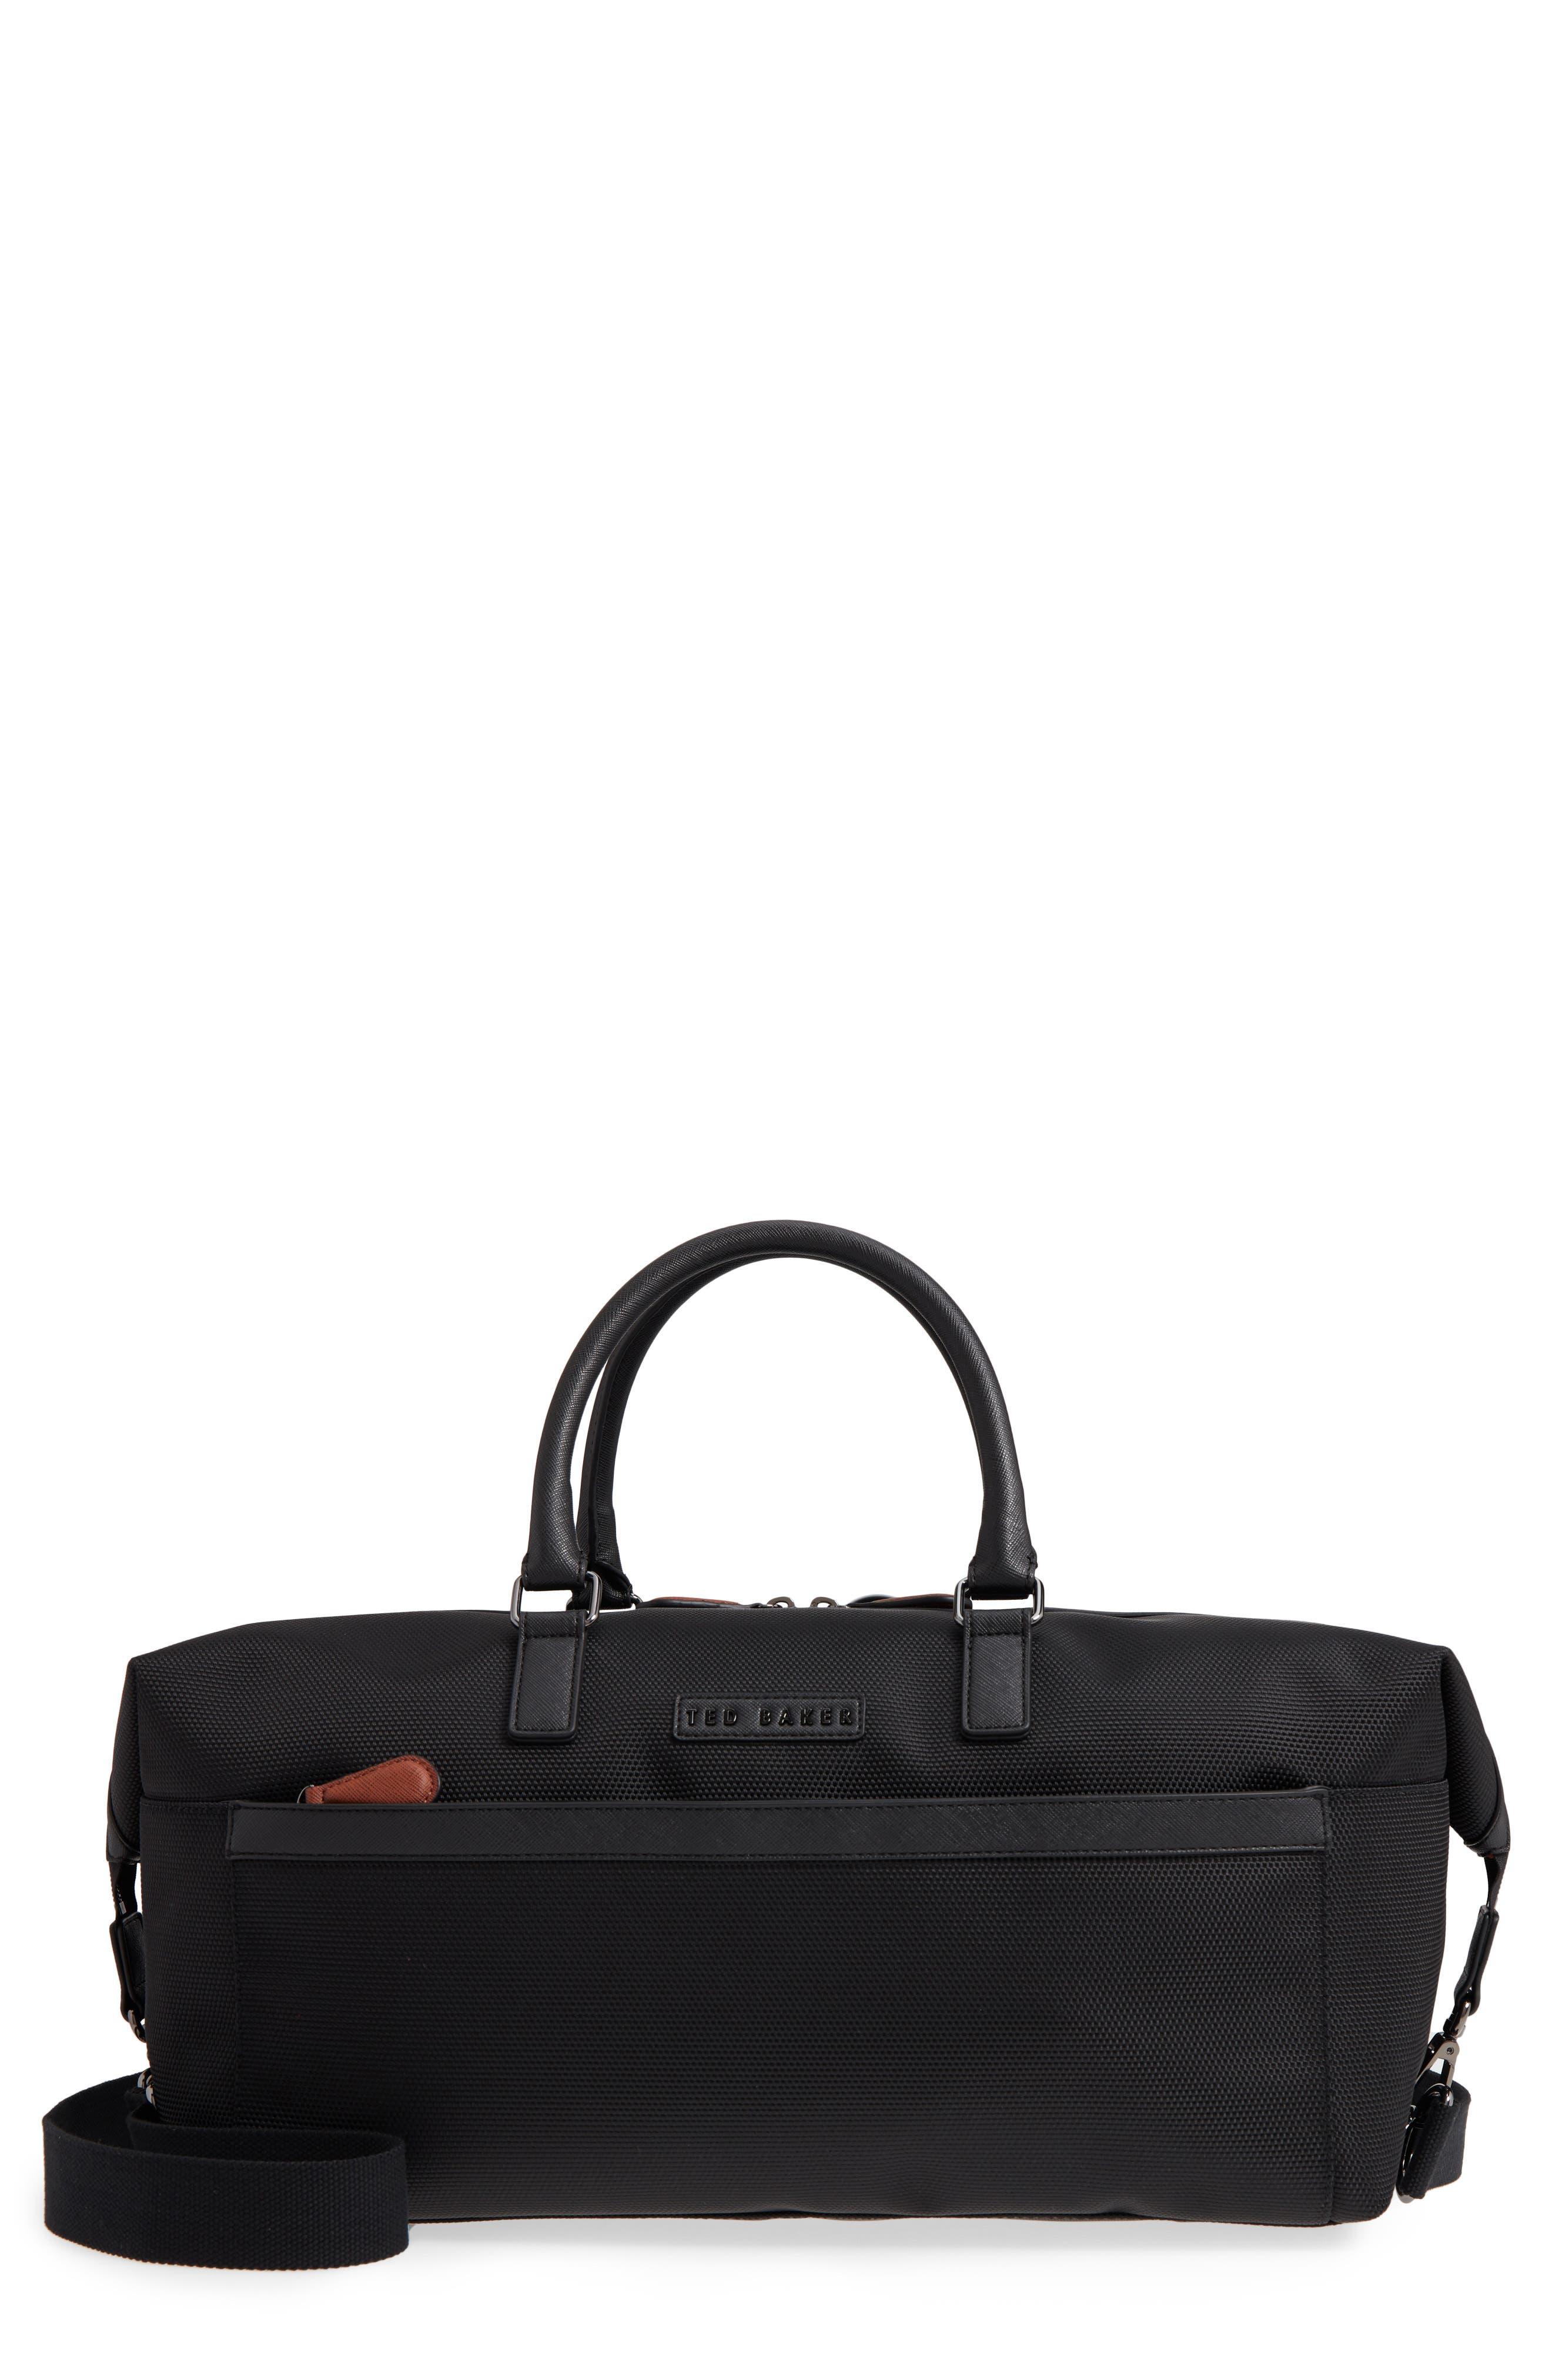 Smart Duffel Bag,                             Main thumbnail 1, color,                             Black